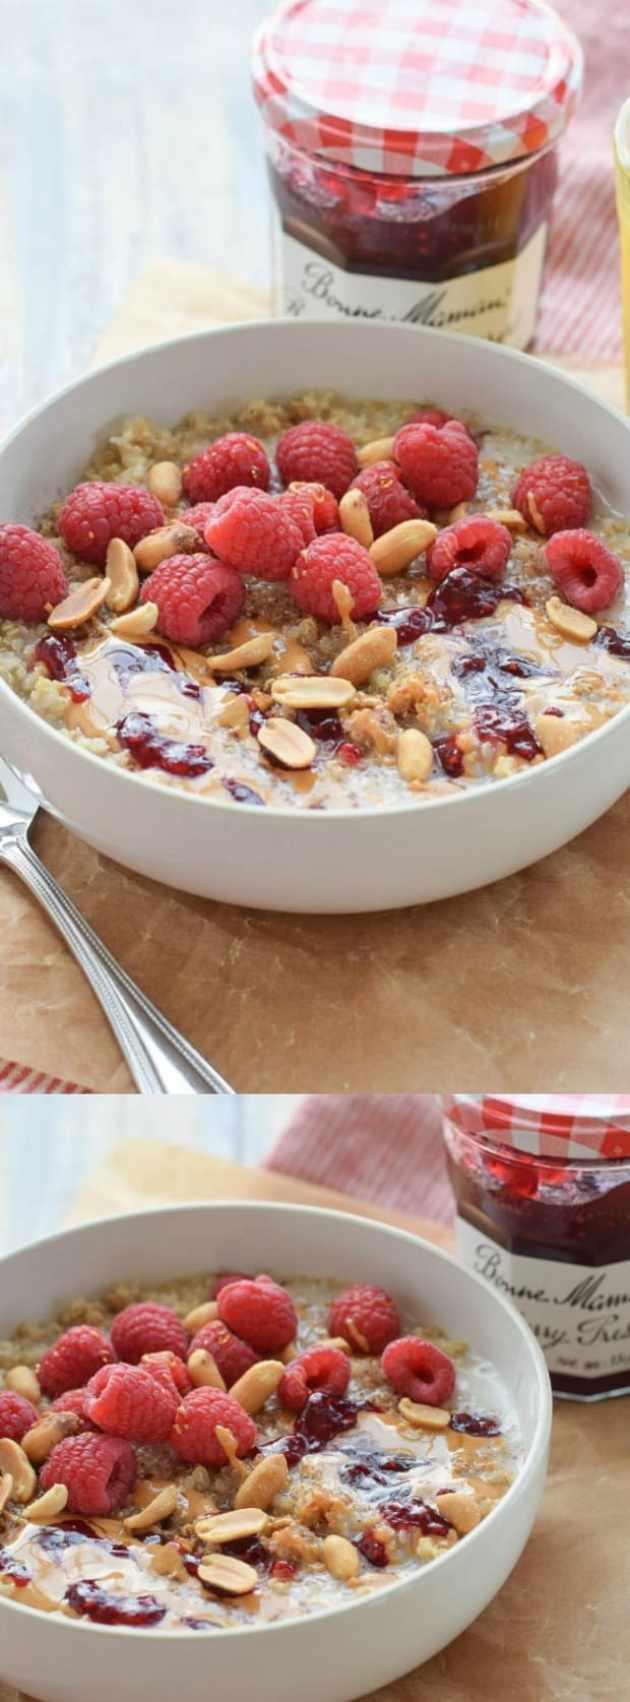 peanut butter and preserves breakfast quinoa longpin